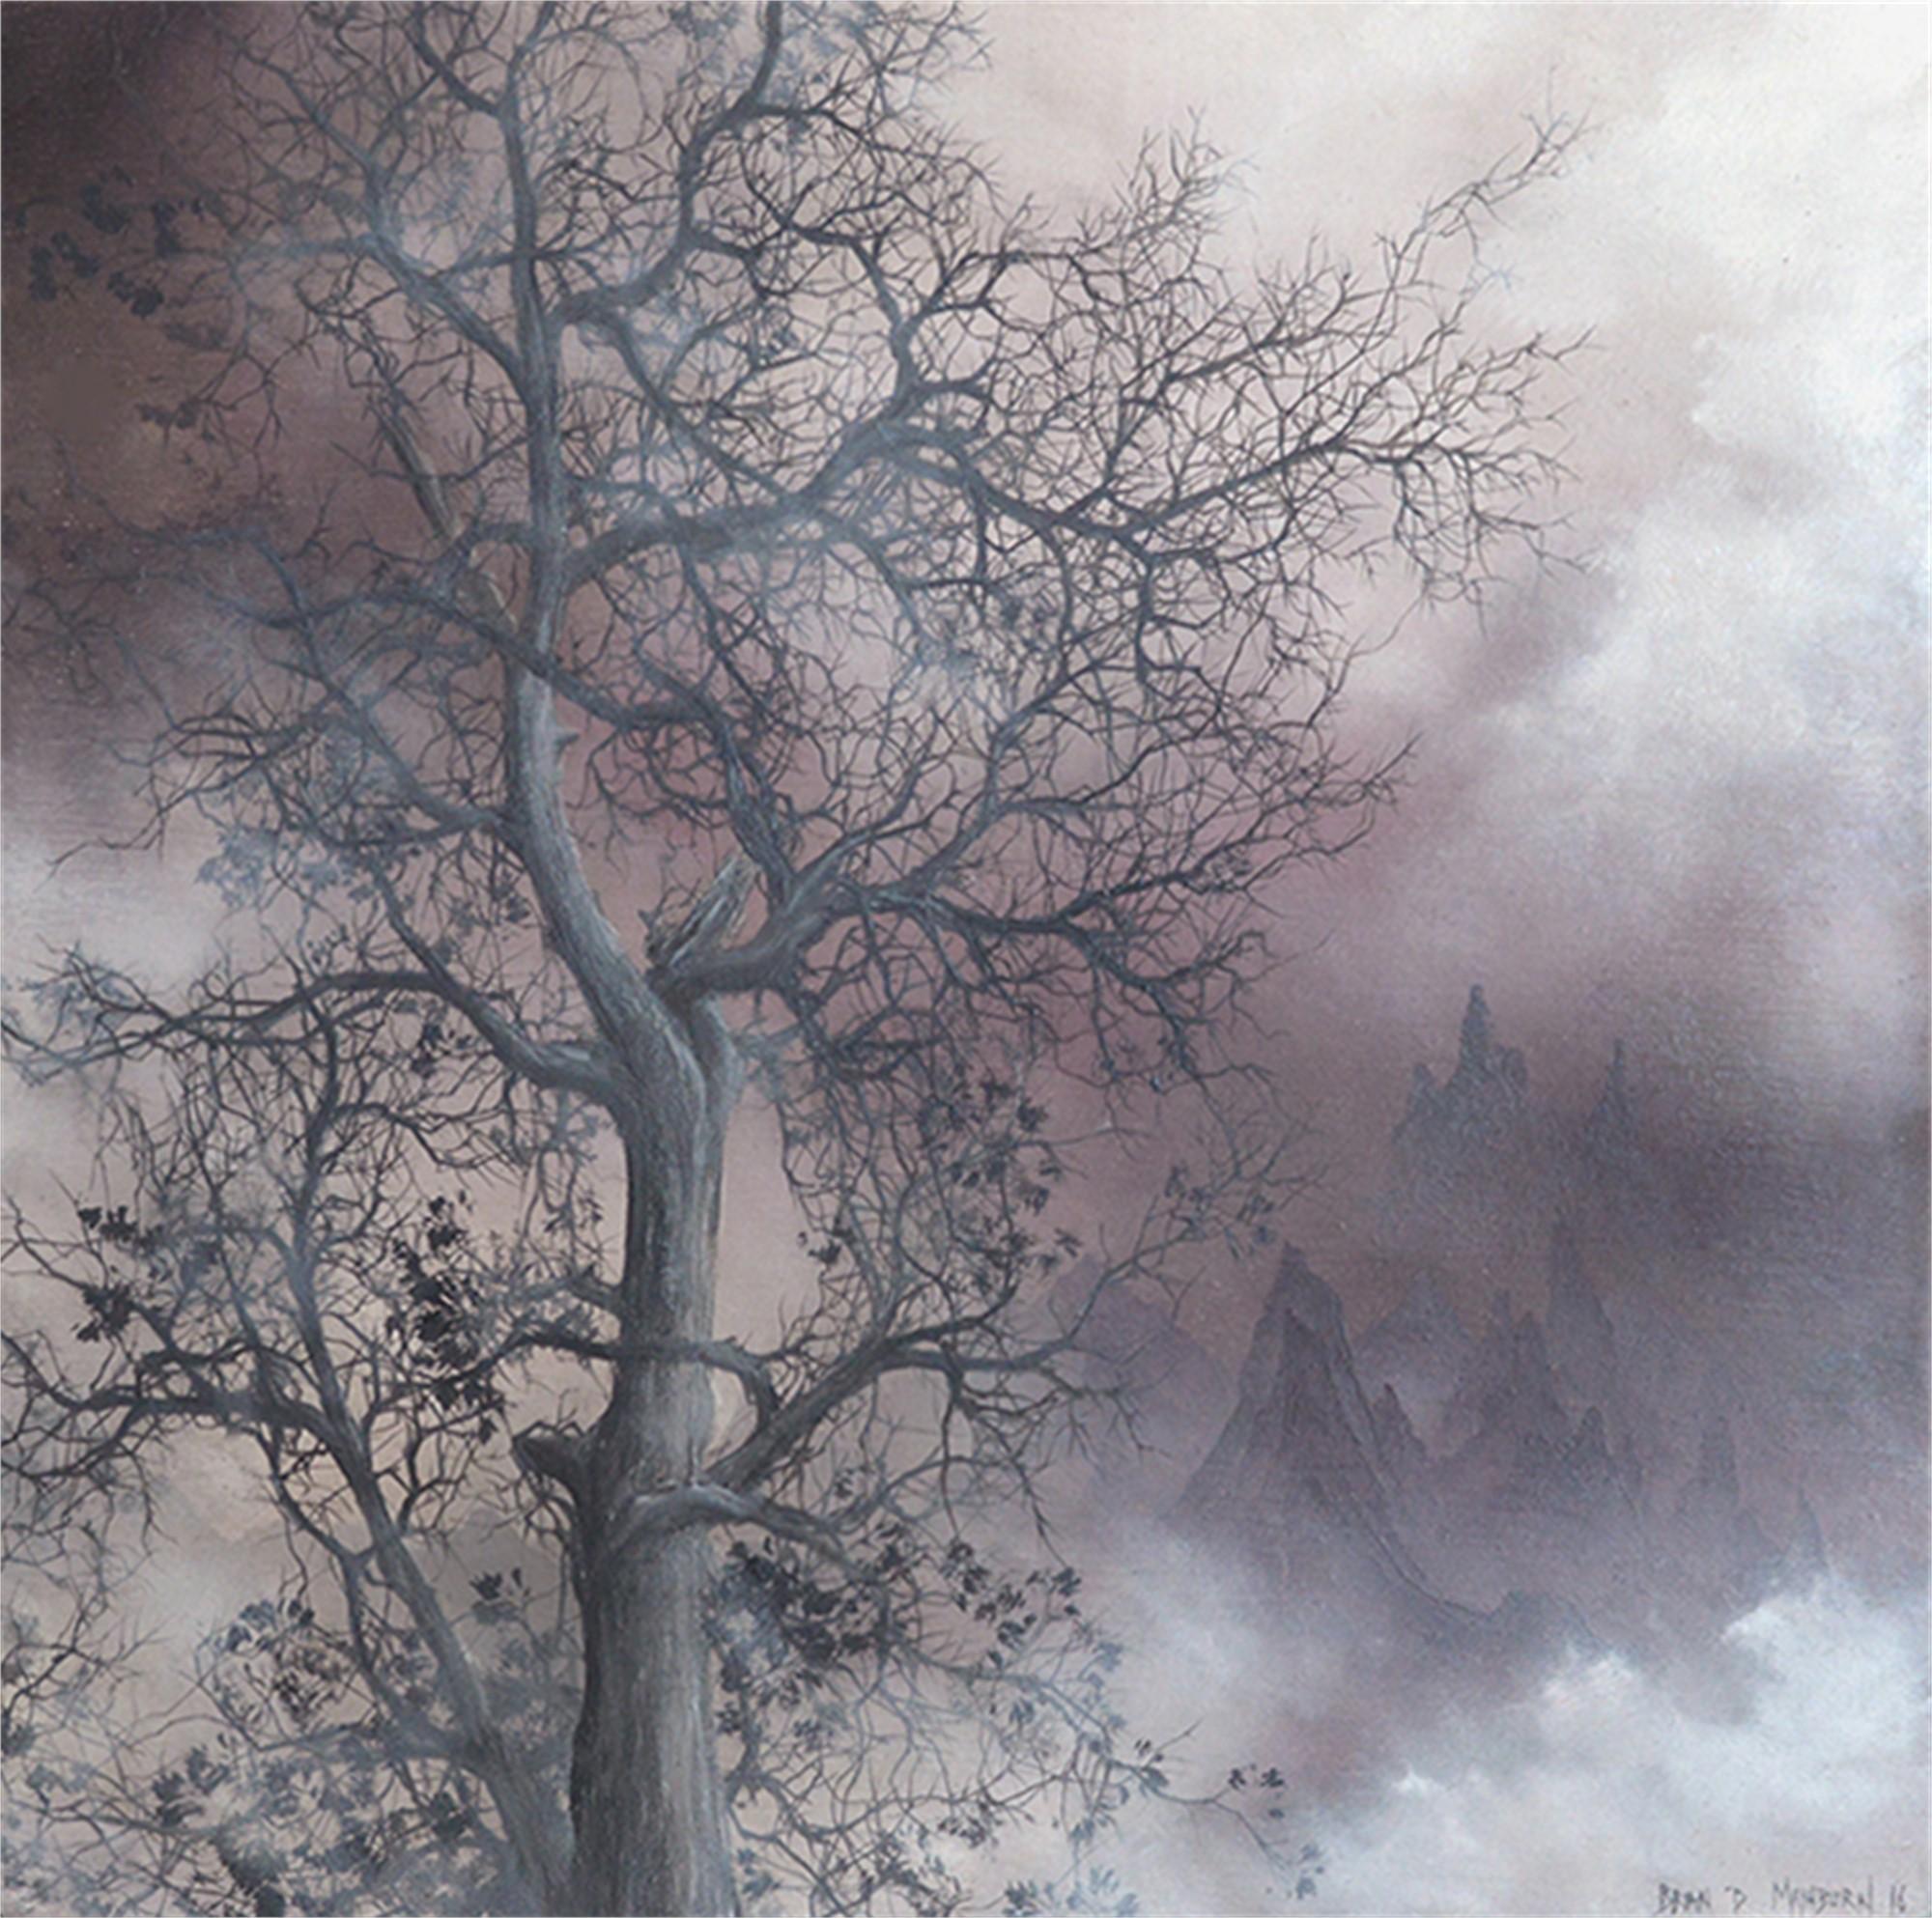 Mist Shrouded Tree by Brian Mashburn